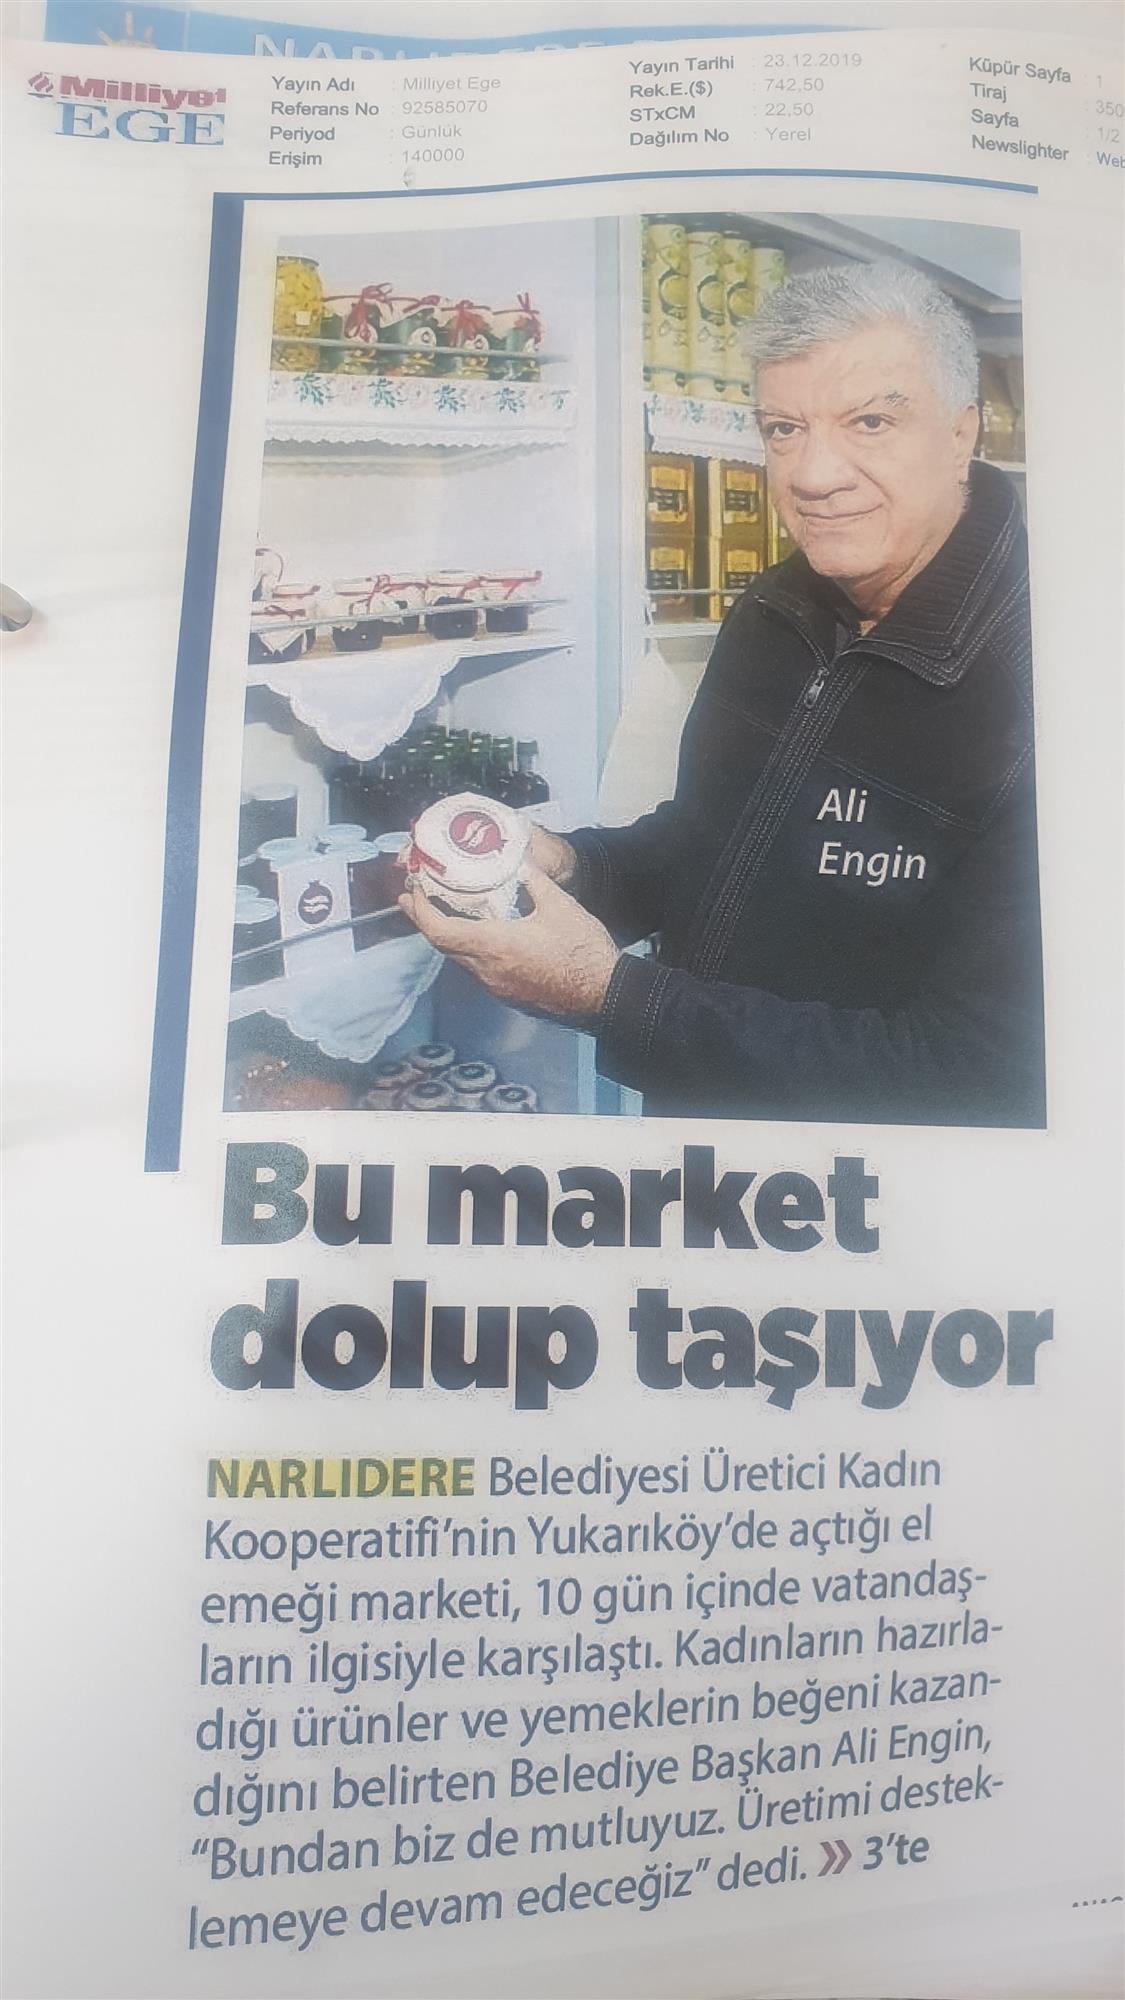 gazete-haberleri202012816422343